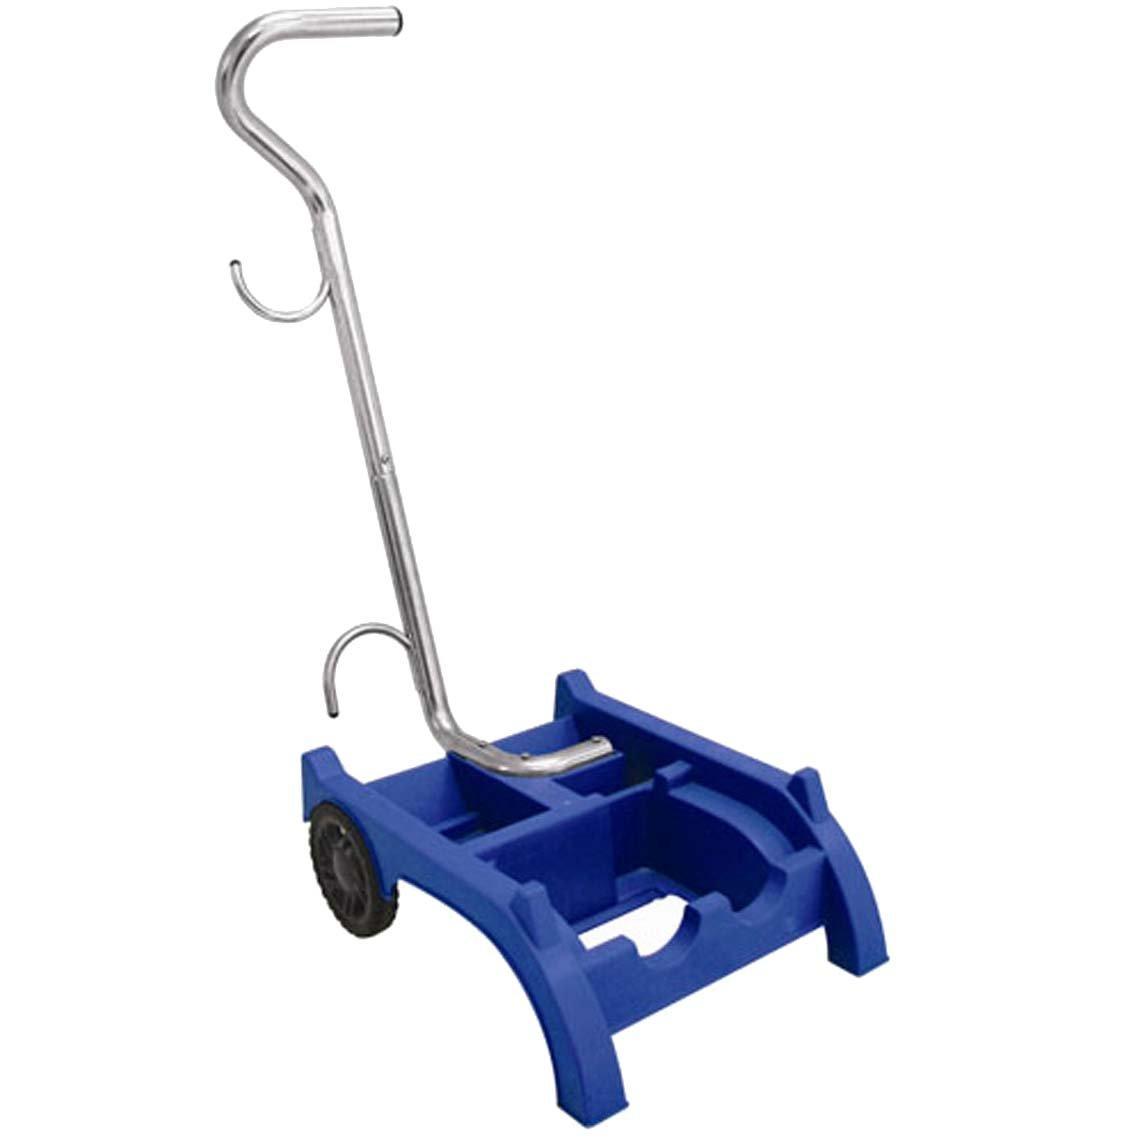 Aqua Buggy Robotic Pool Cleaner Carrying Cart